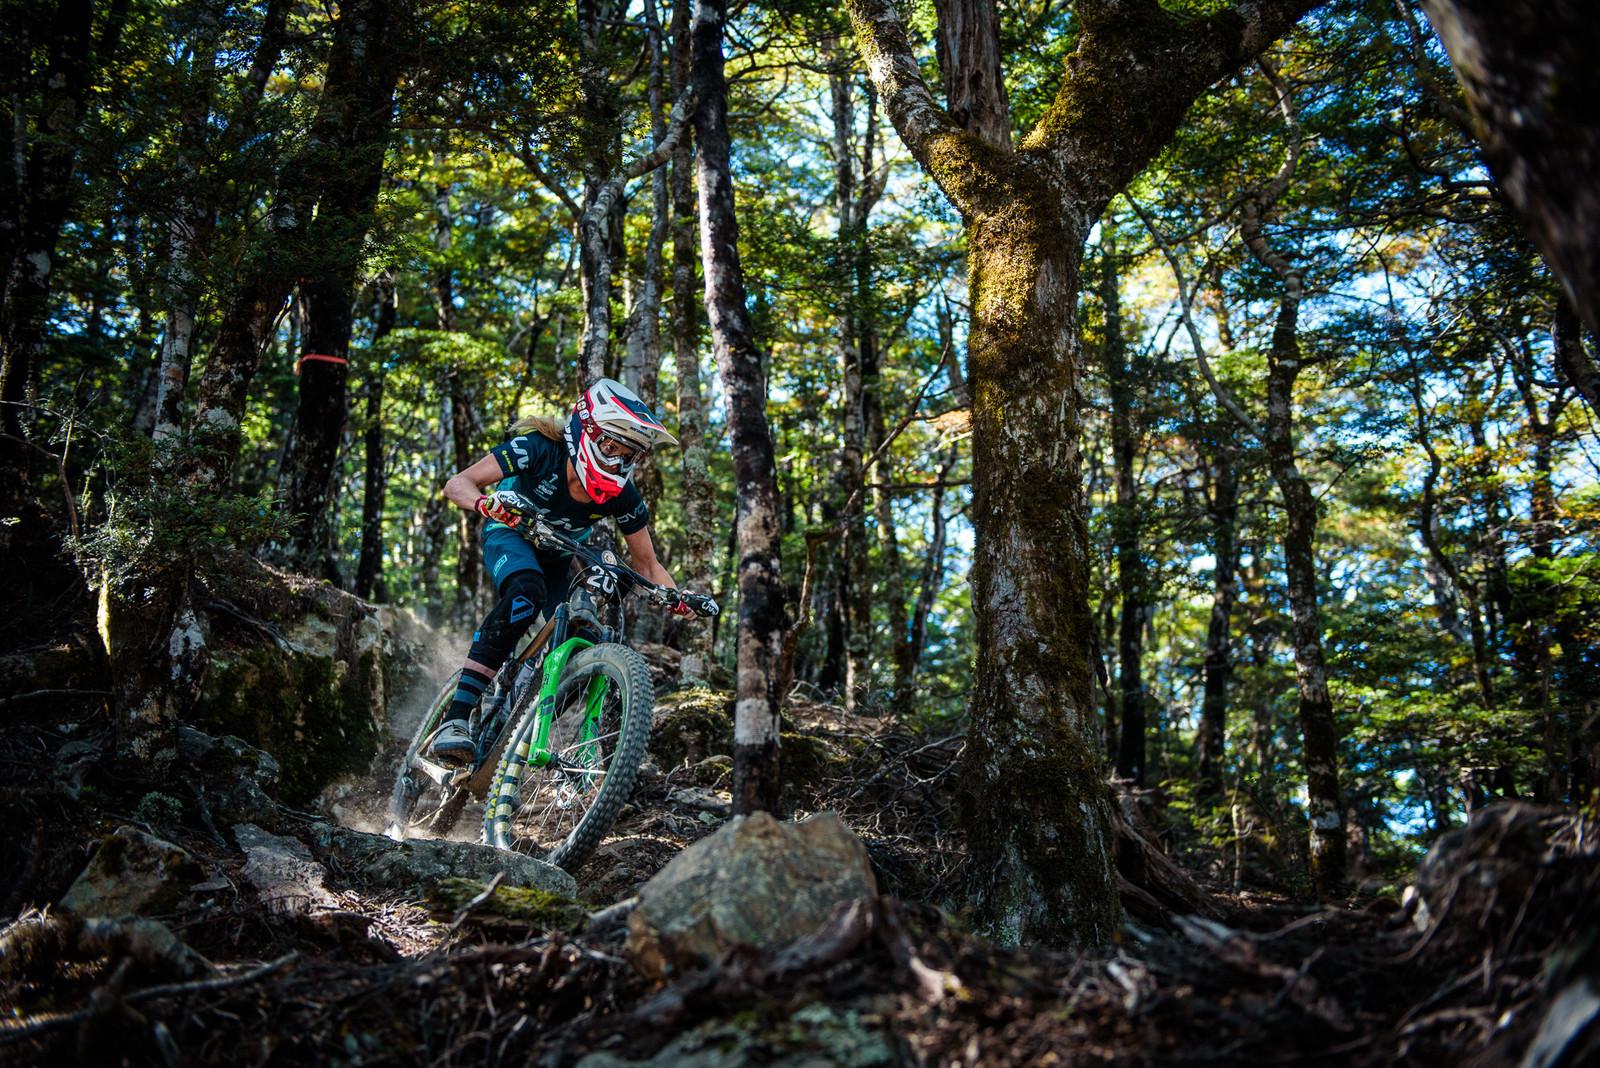 Rae Morrison - 2019 Dodzy Memorial Enduro - Mountain Biking Pictures - Vital MTB